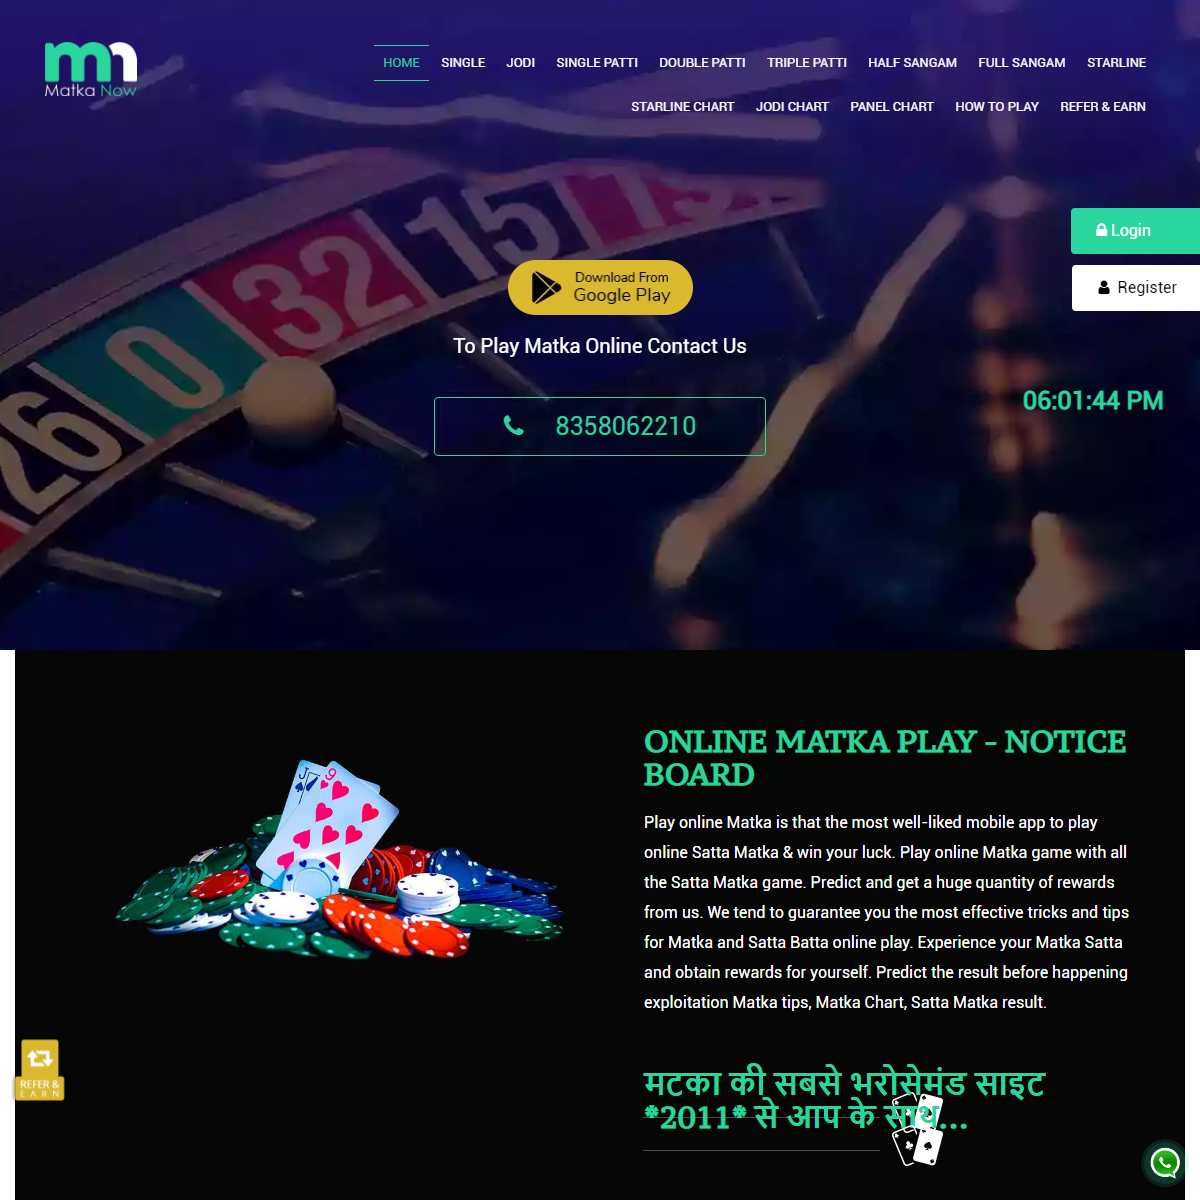 Online Matka Play - Satta Matka - Matka Play - Matkanow